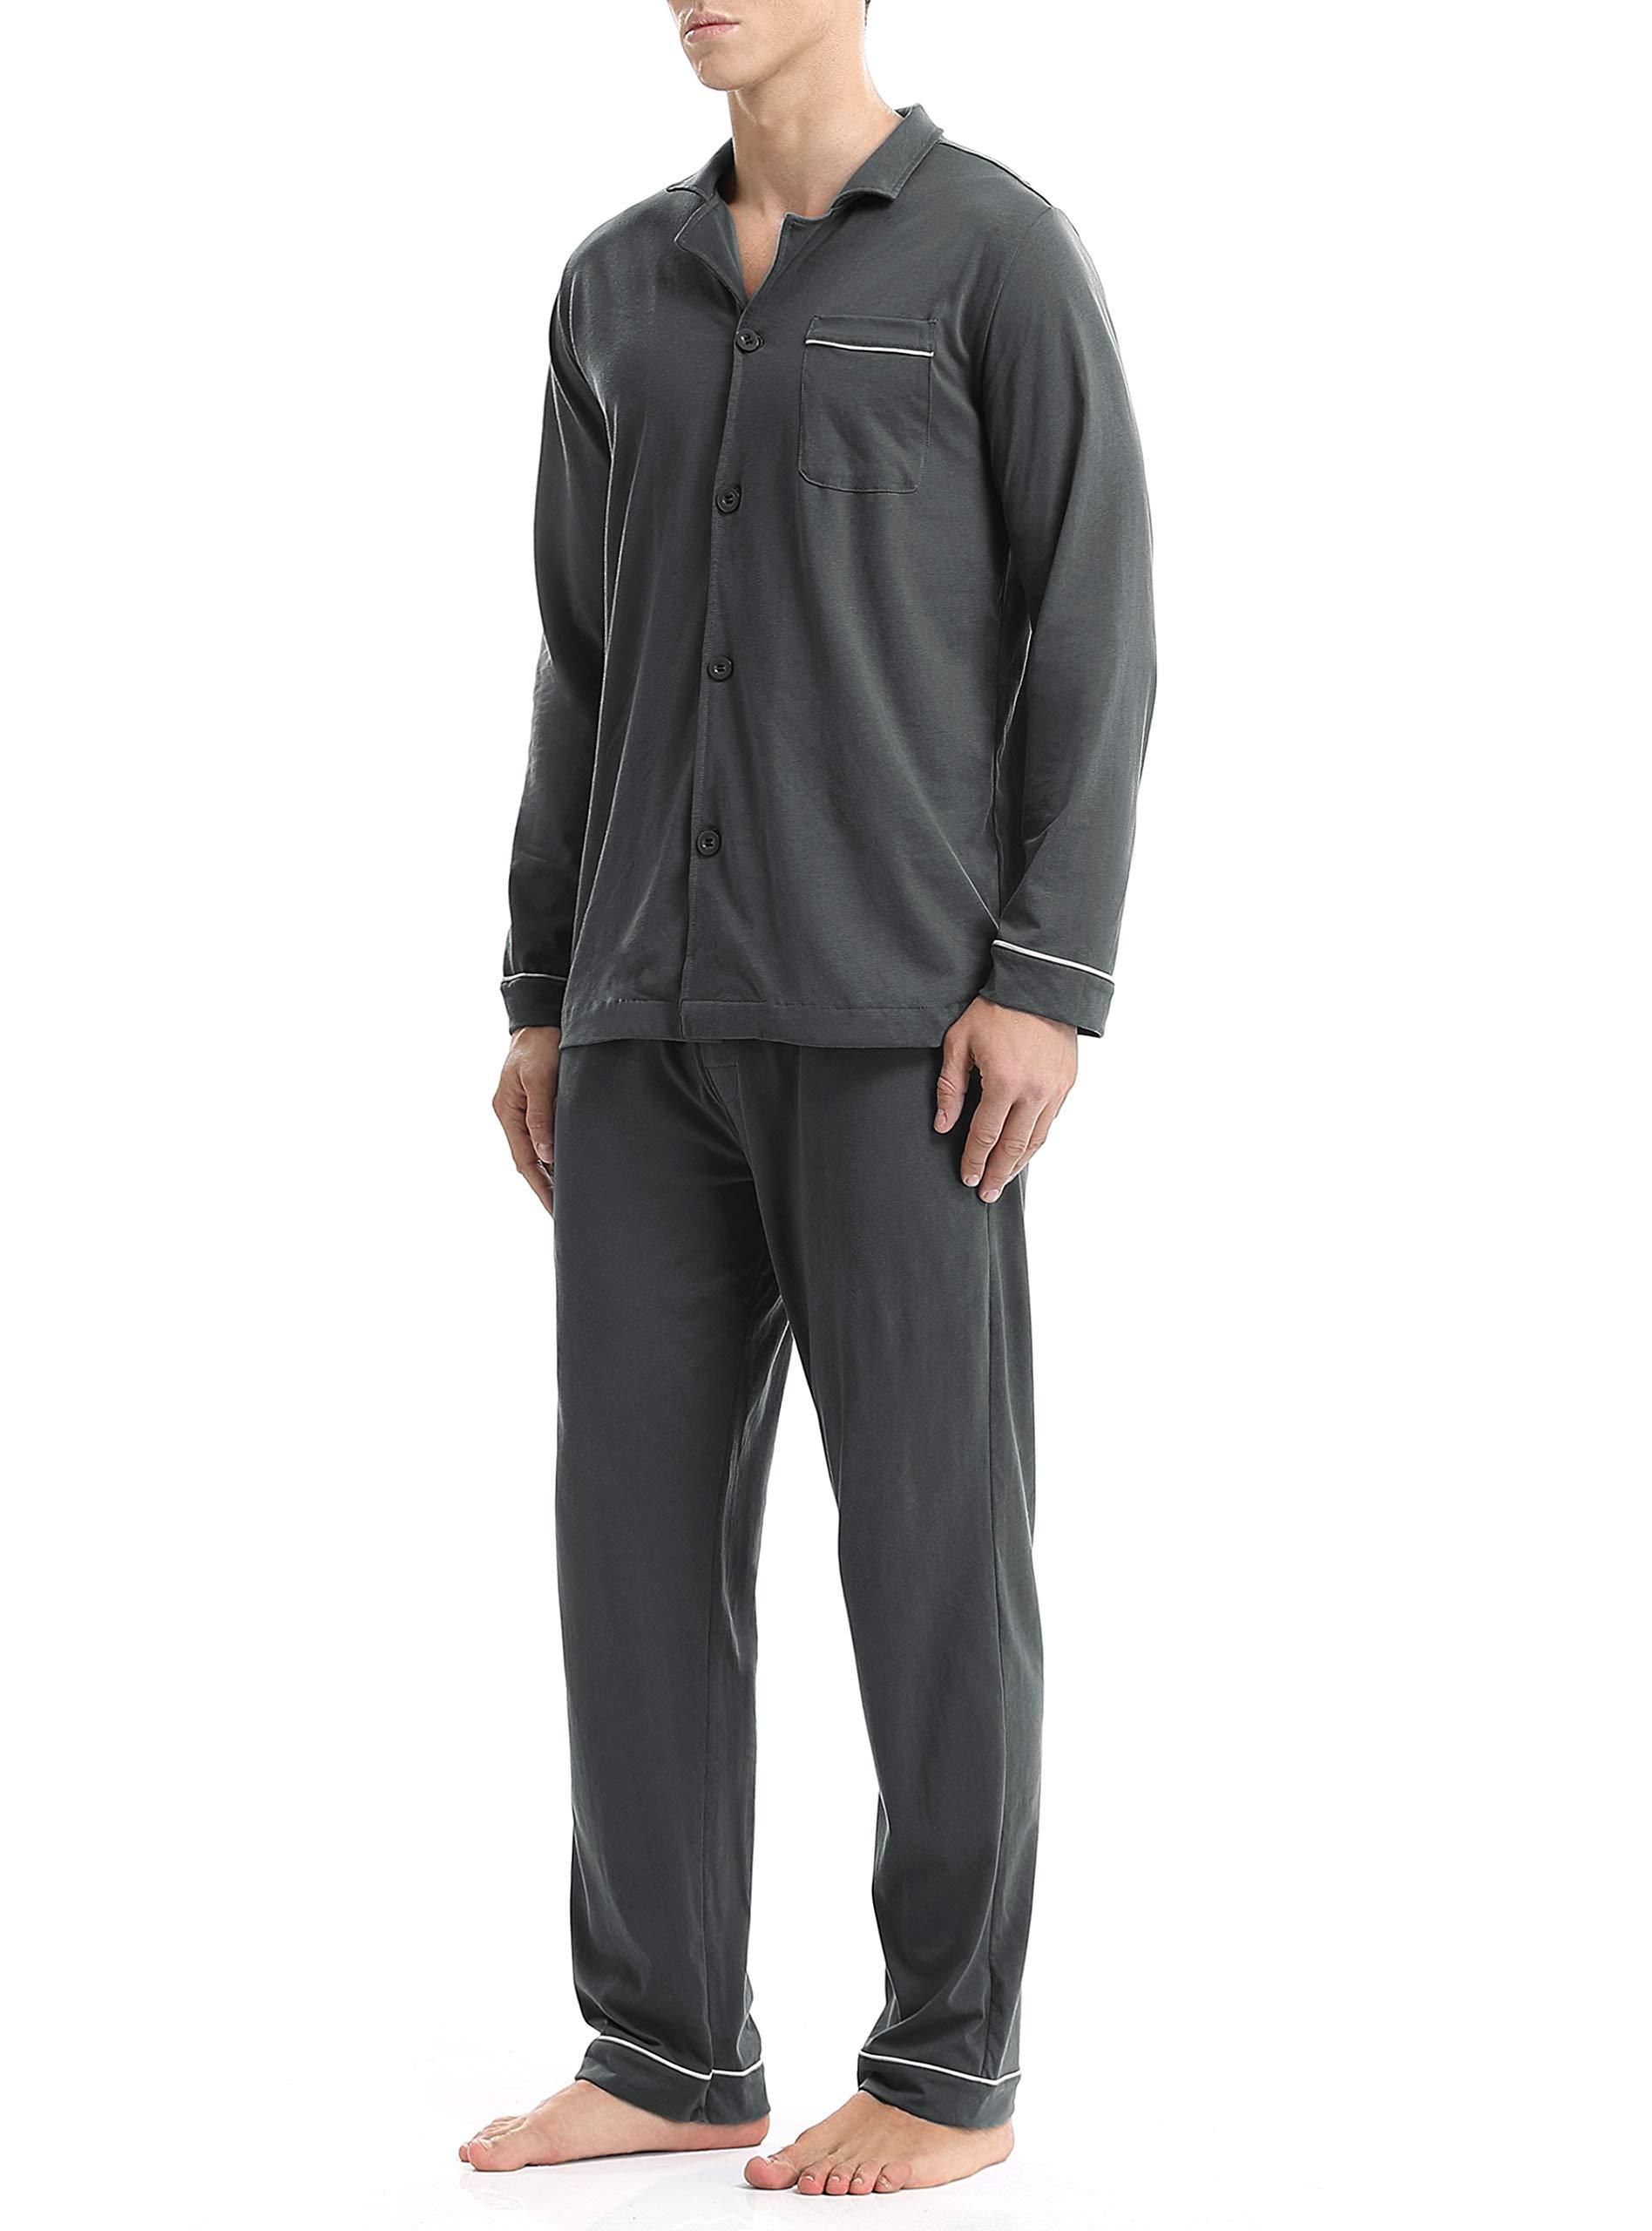 David Archy Men's 100% Cotton Long Button-Down Sleepwear Pajama Set (M, Dark Gray)